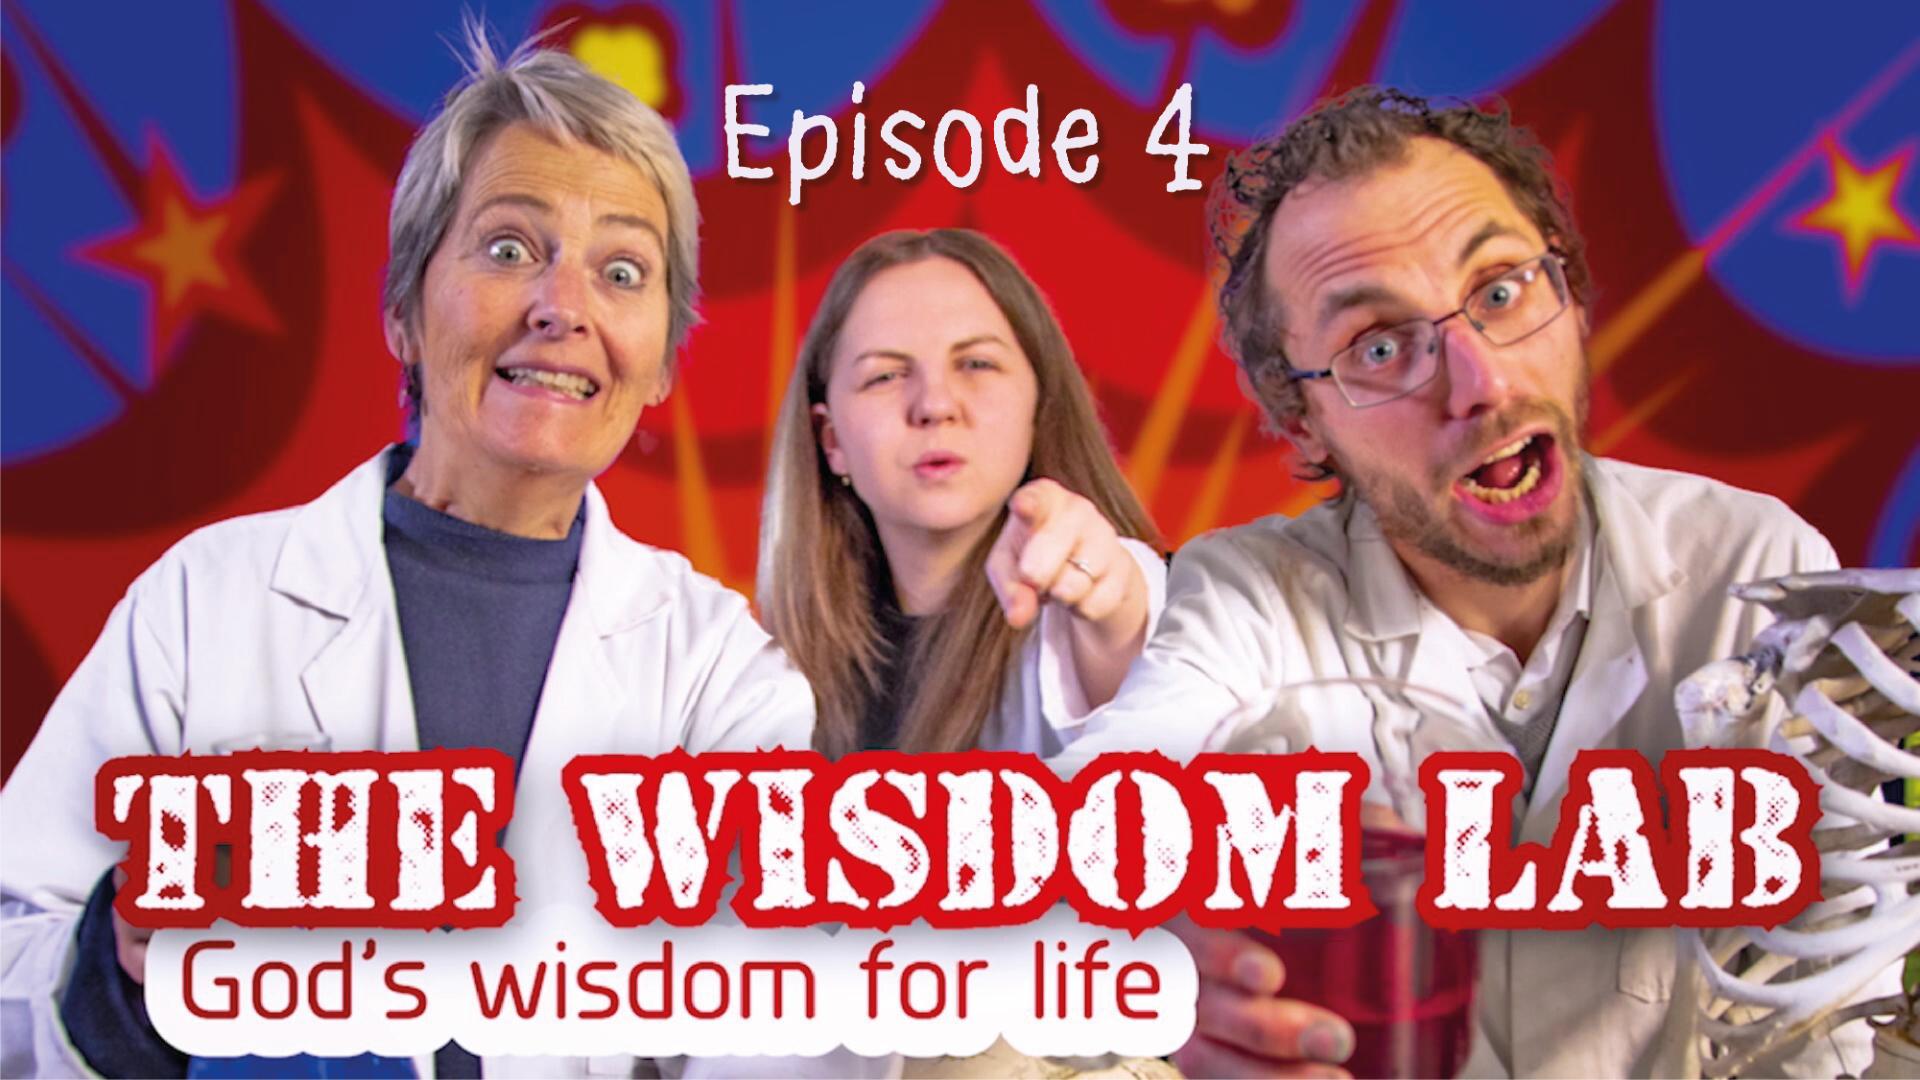 The Wisdom Lab: Episode 4